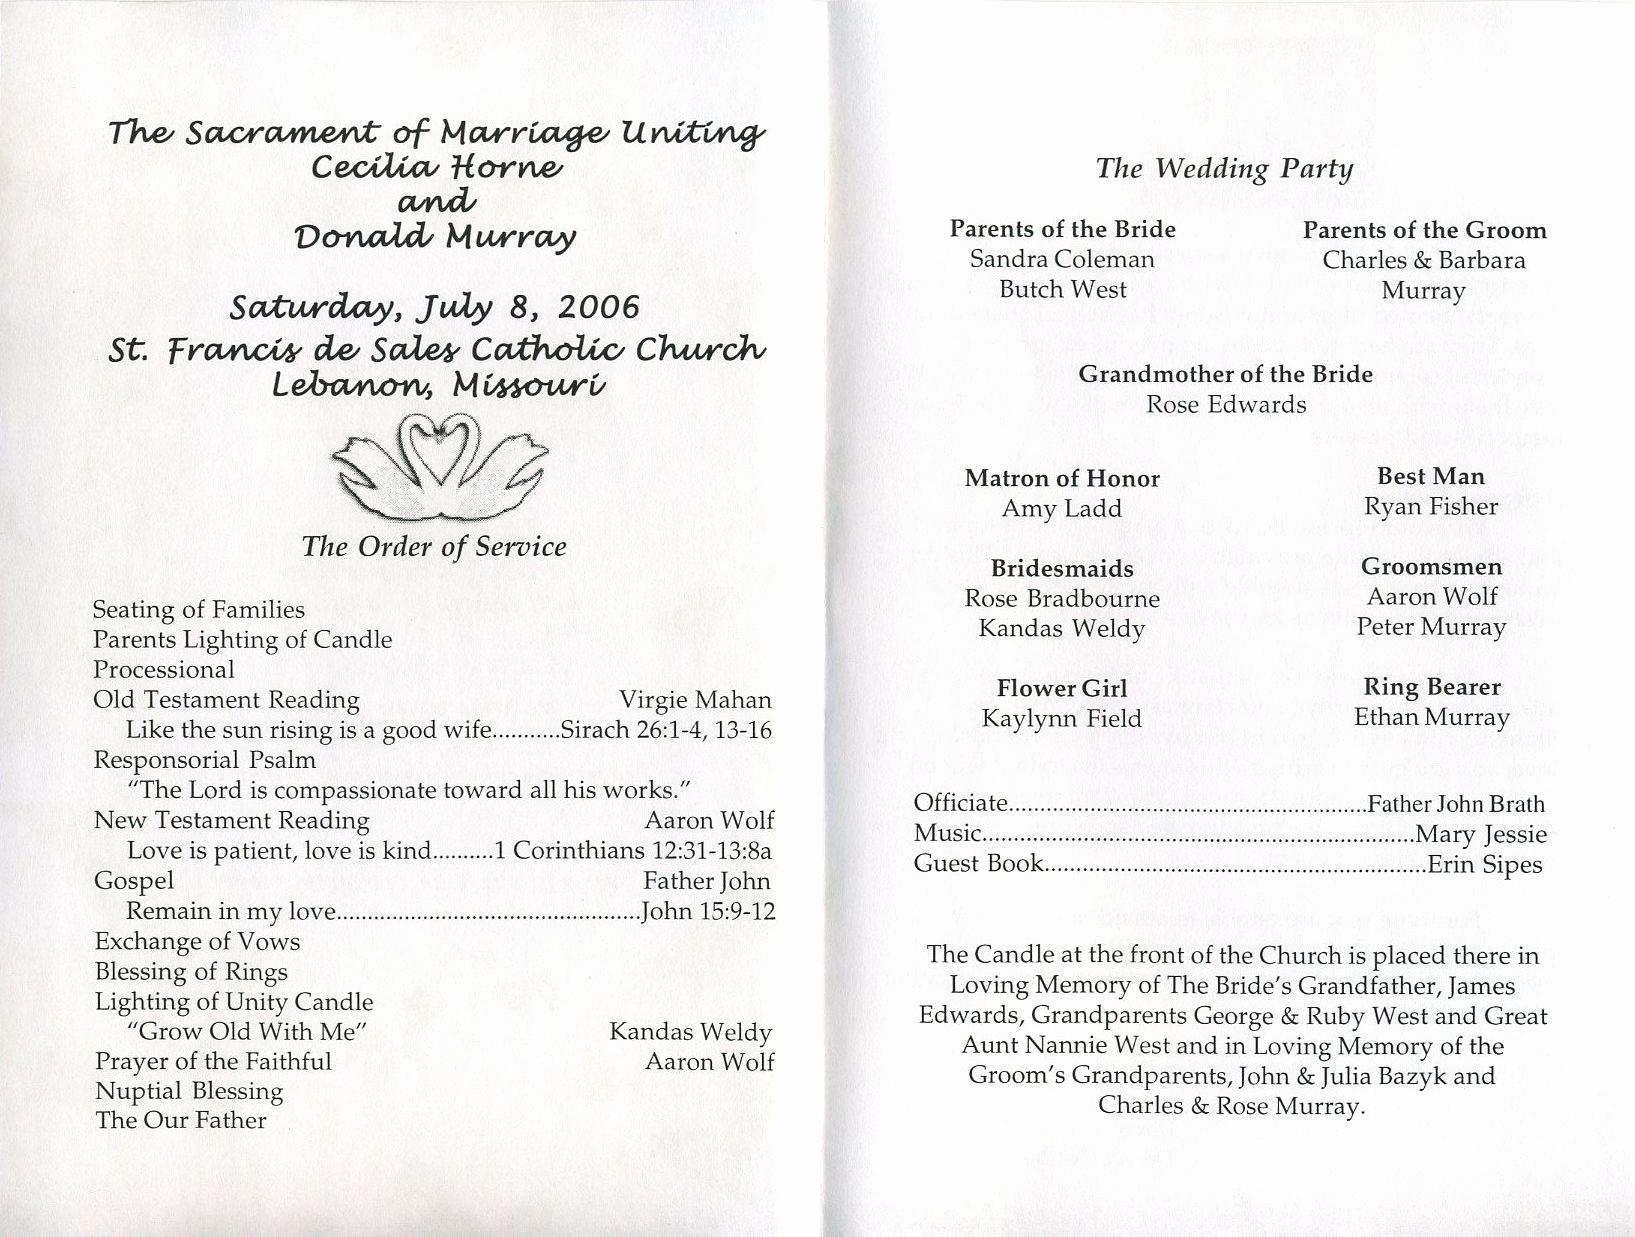 Free Sample Wedding Programs Templates Best Of Free Printable Wedding Programs Templates